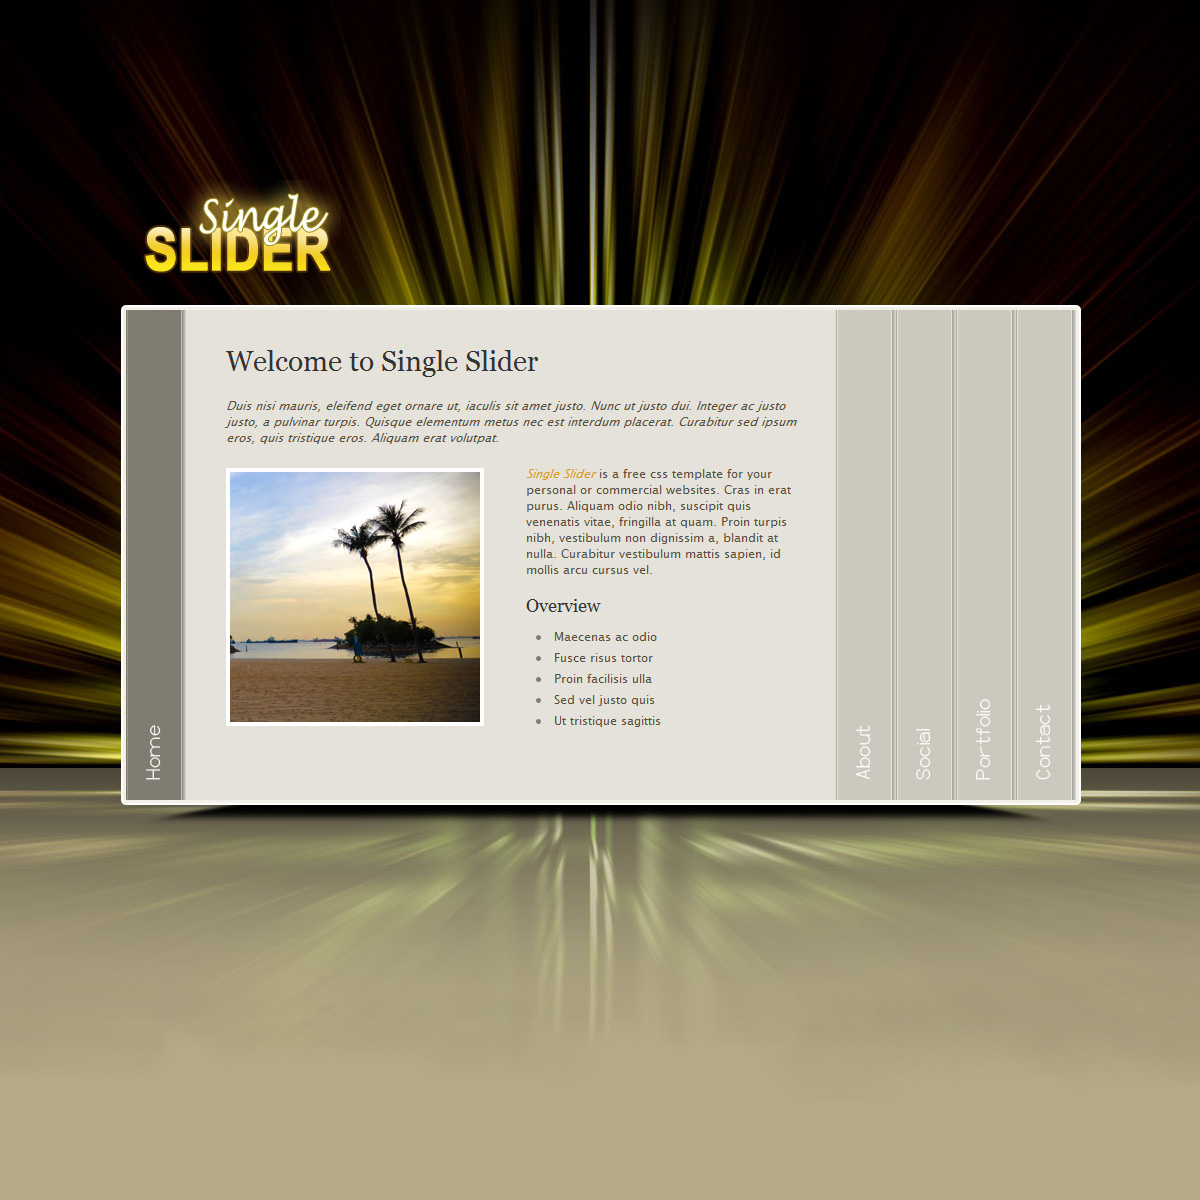 Single Slider